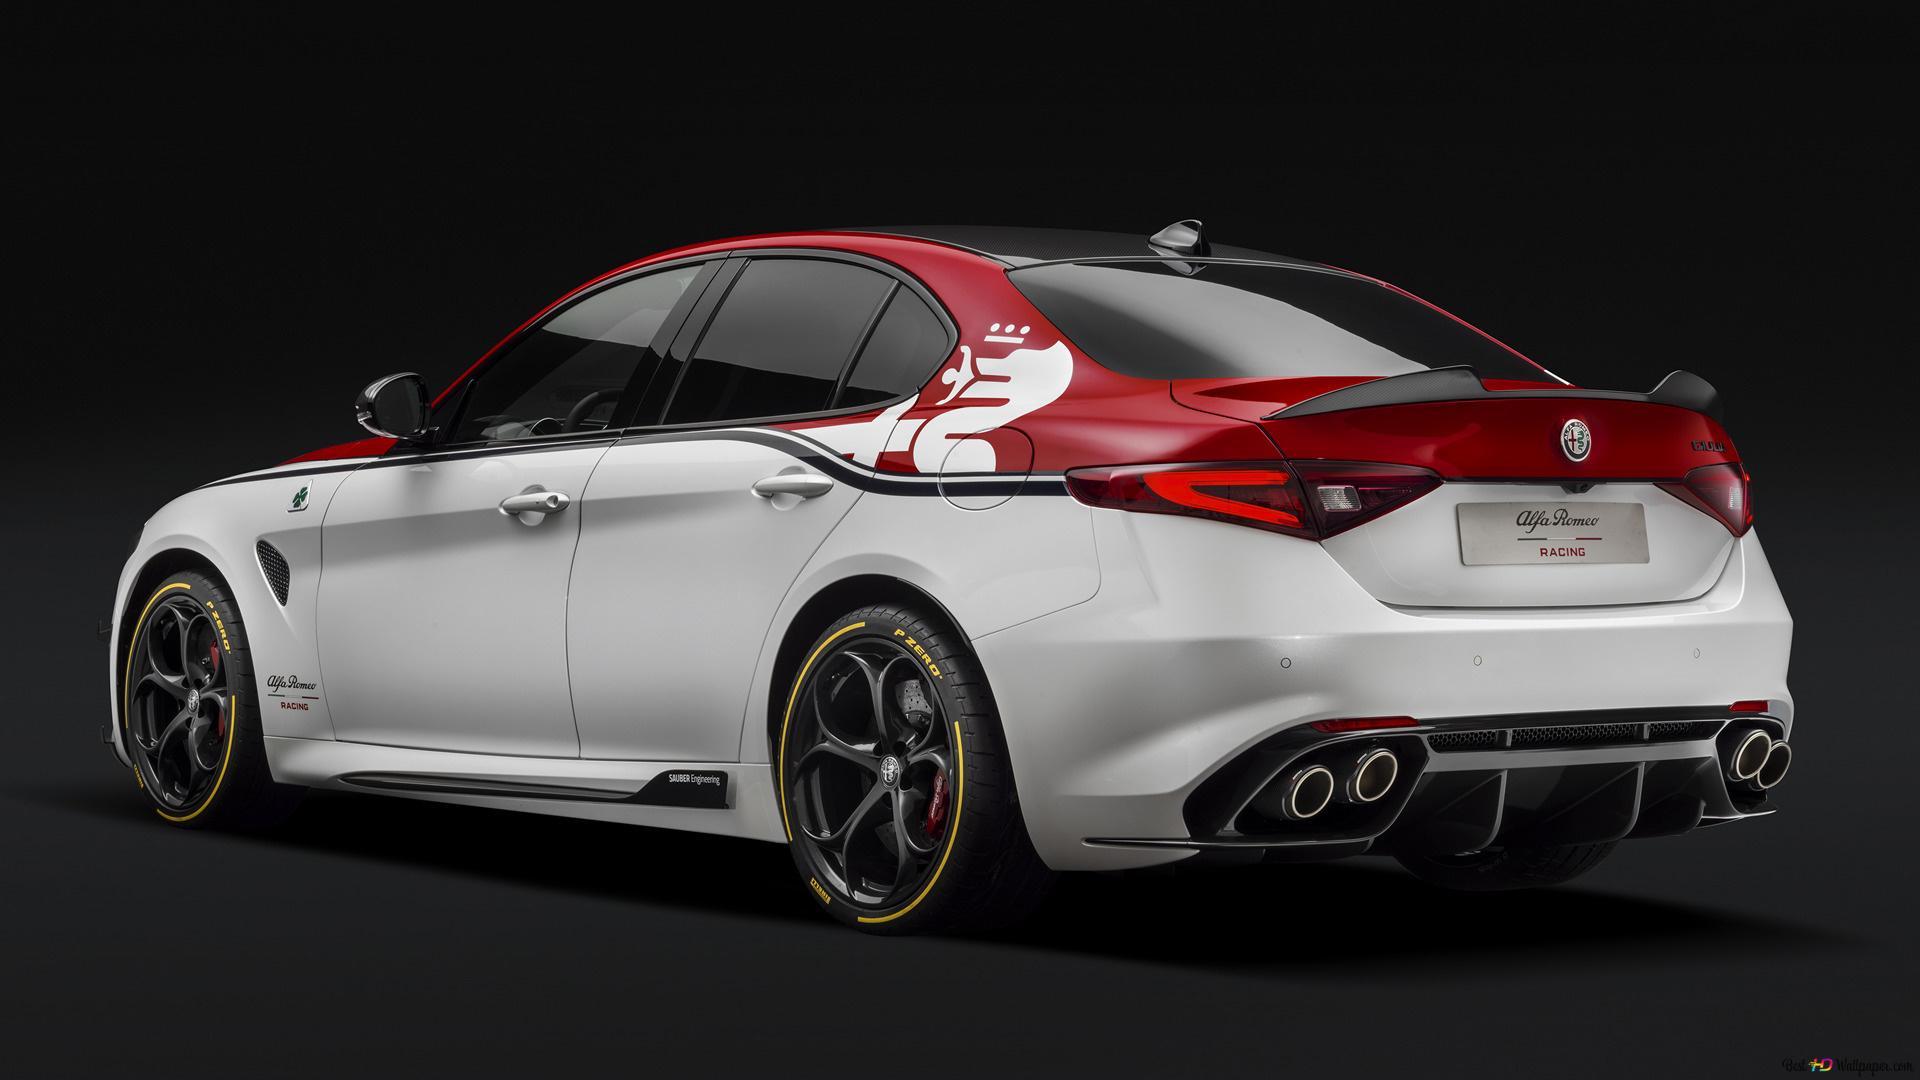 Alfa Romeo Giulia Quadrifoglio Racing Behind Hd Wallpaper Download